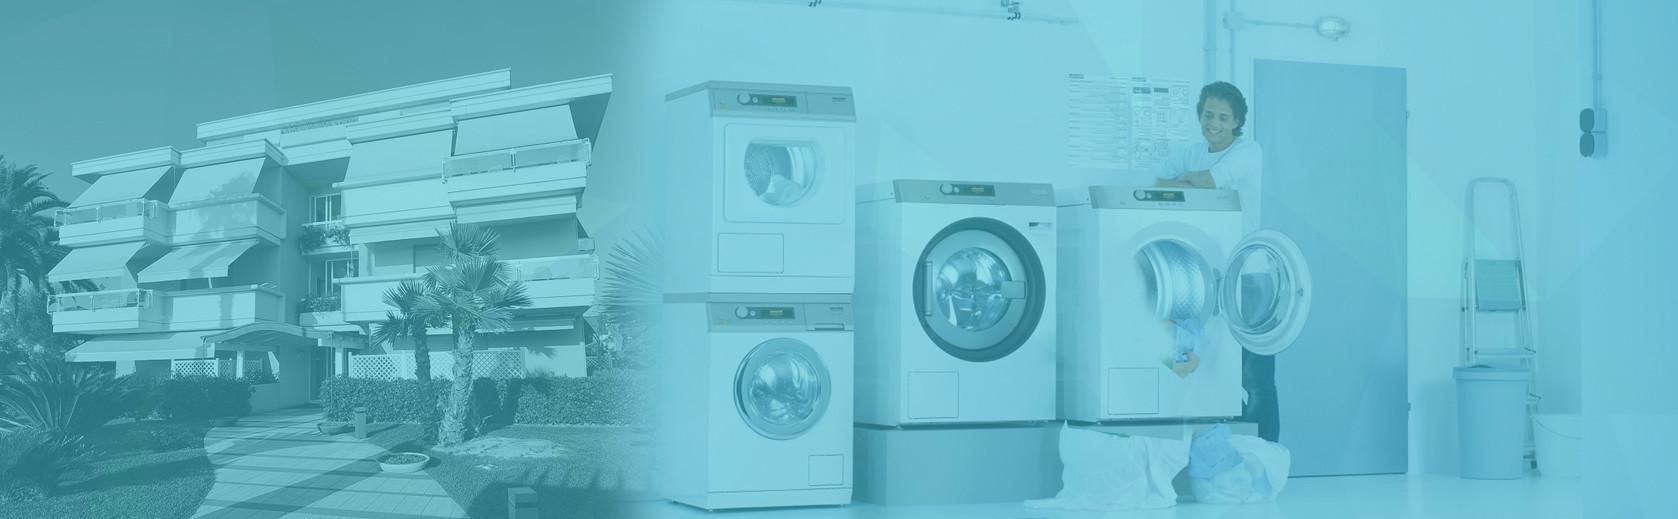 Lavanderia economica ed ecologica per residence